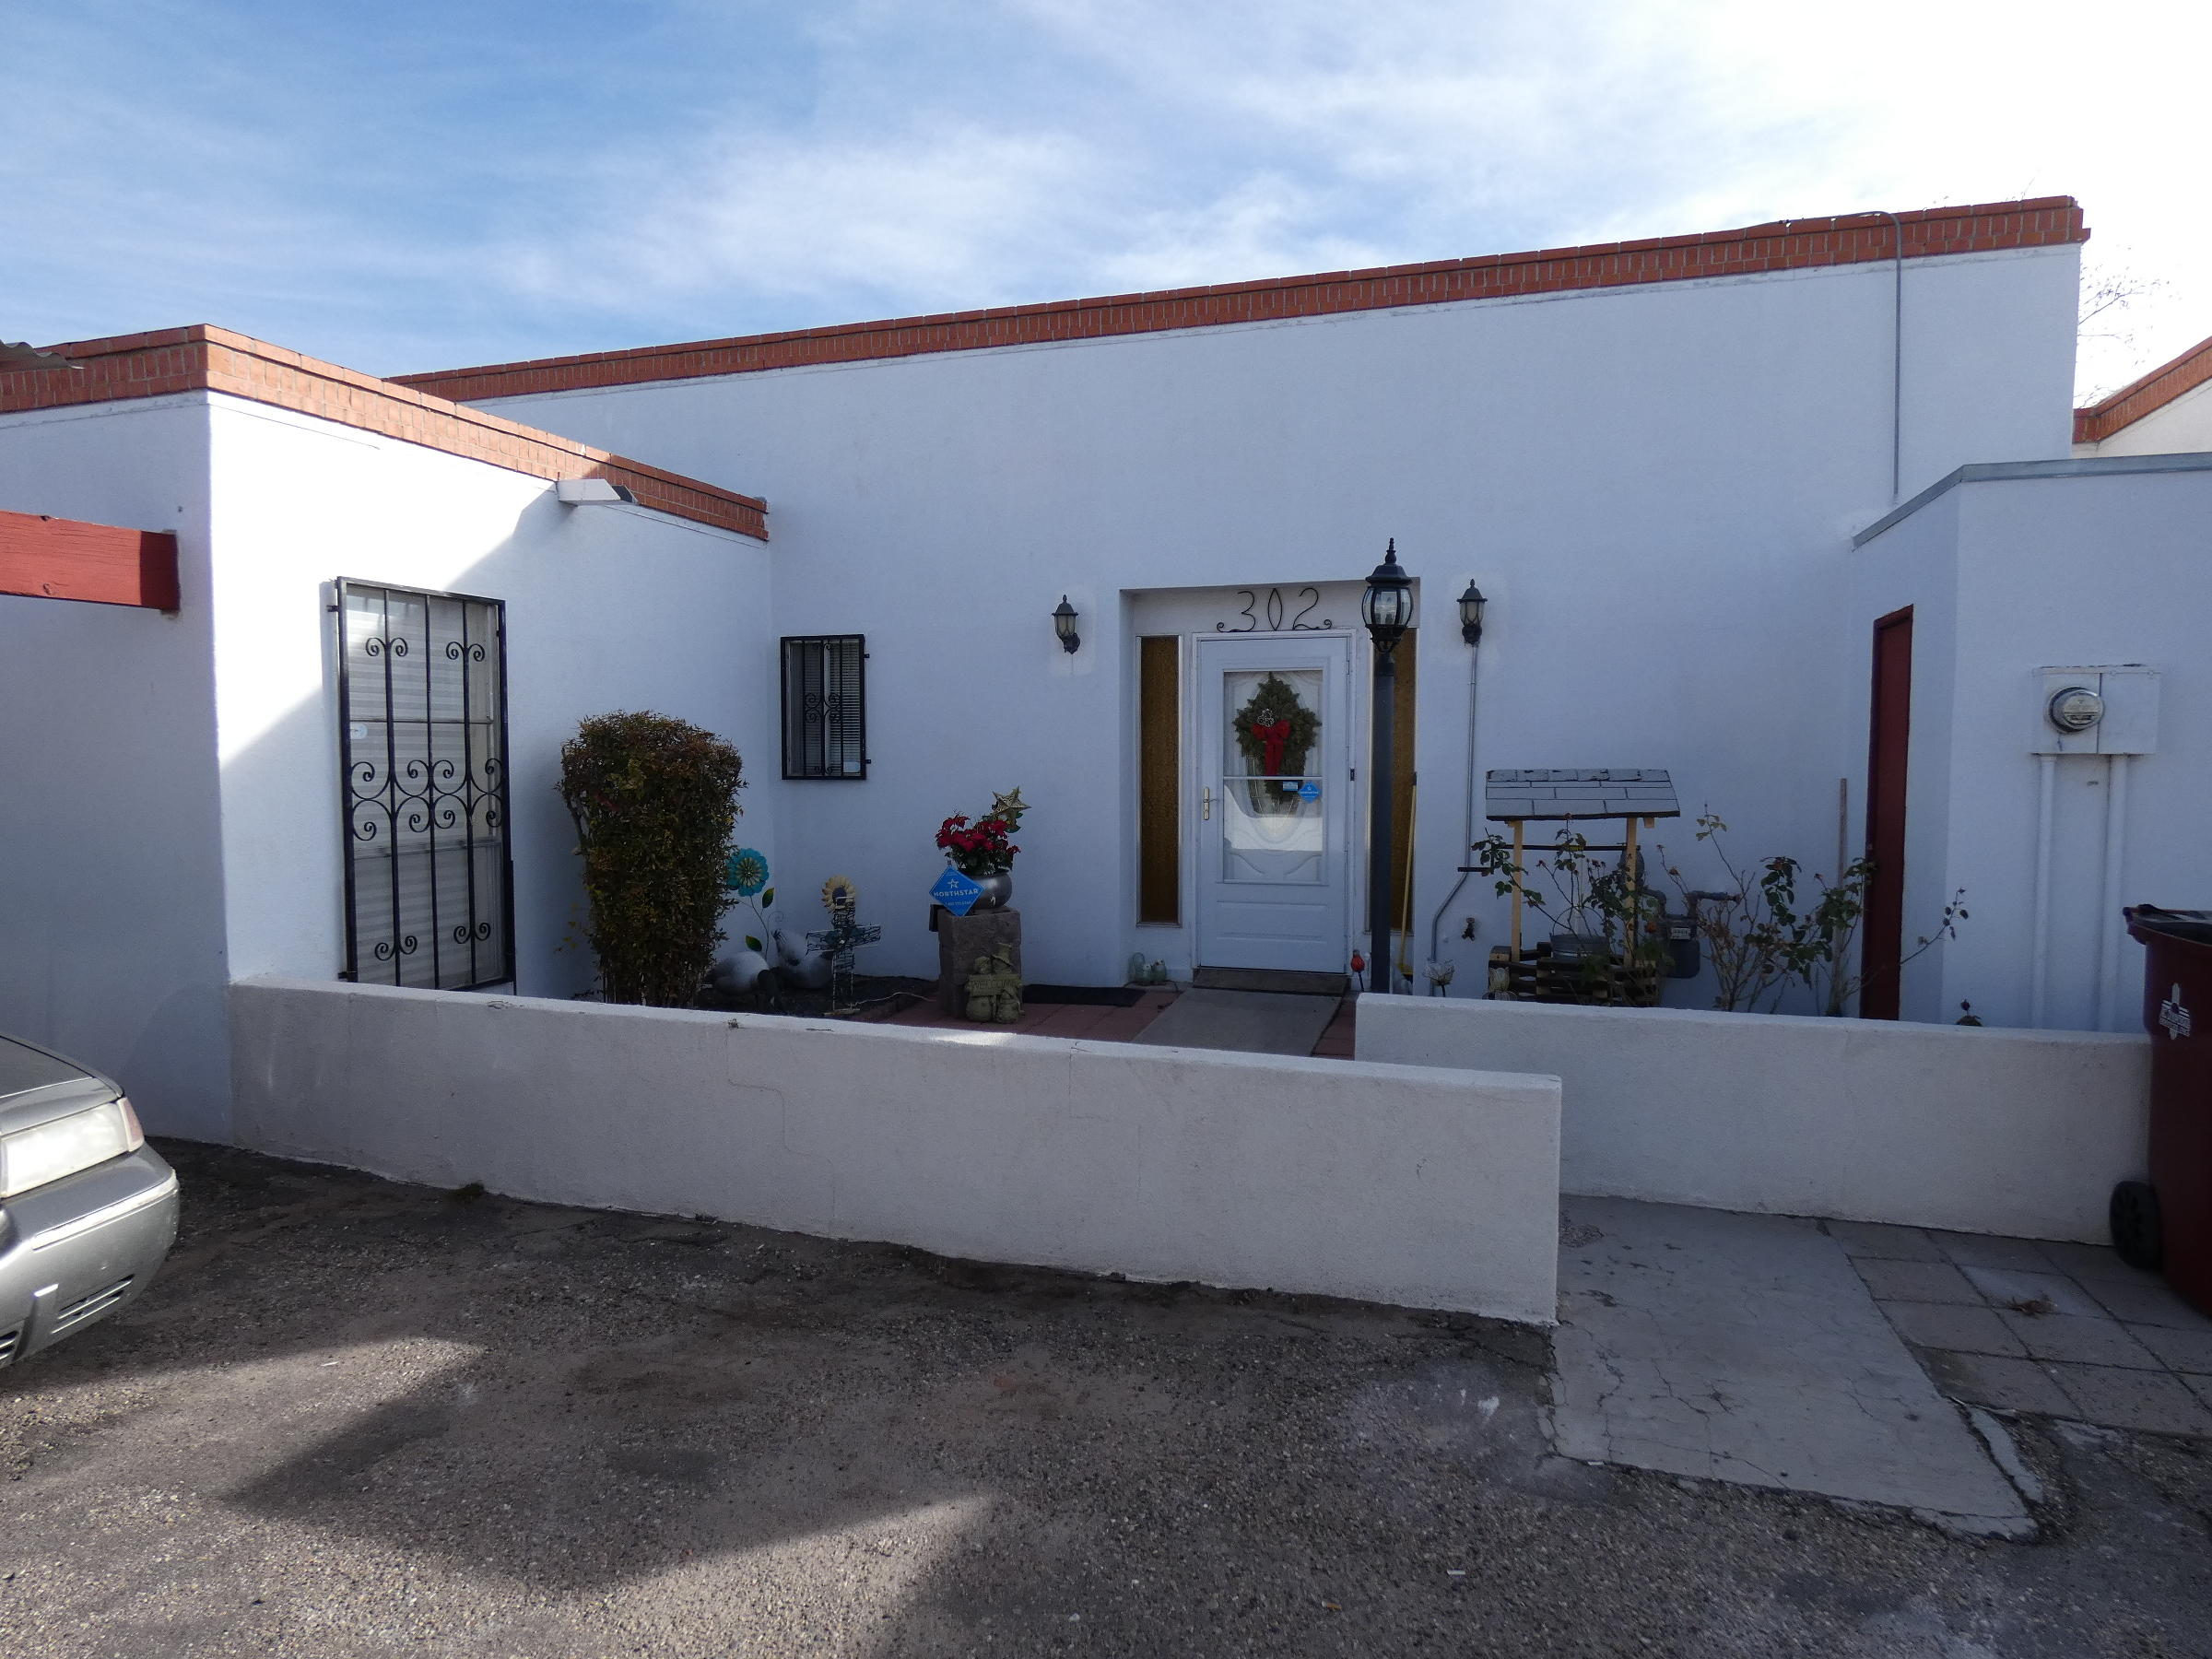 302 Horizon Vista Boulevard, Rio Communities, NM 87002 - Rio Communities, NM real estate listing